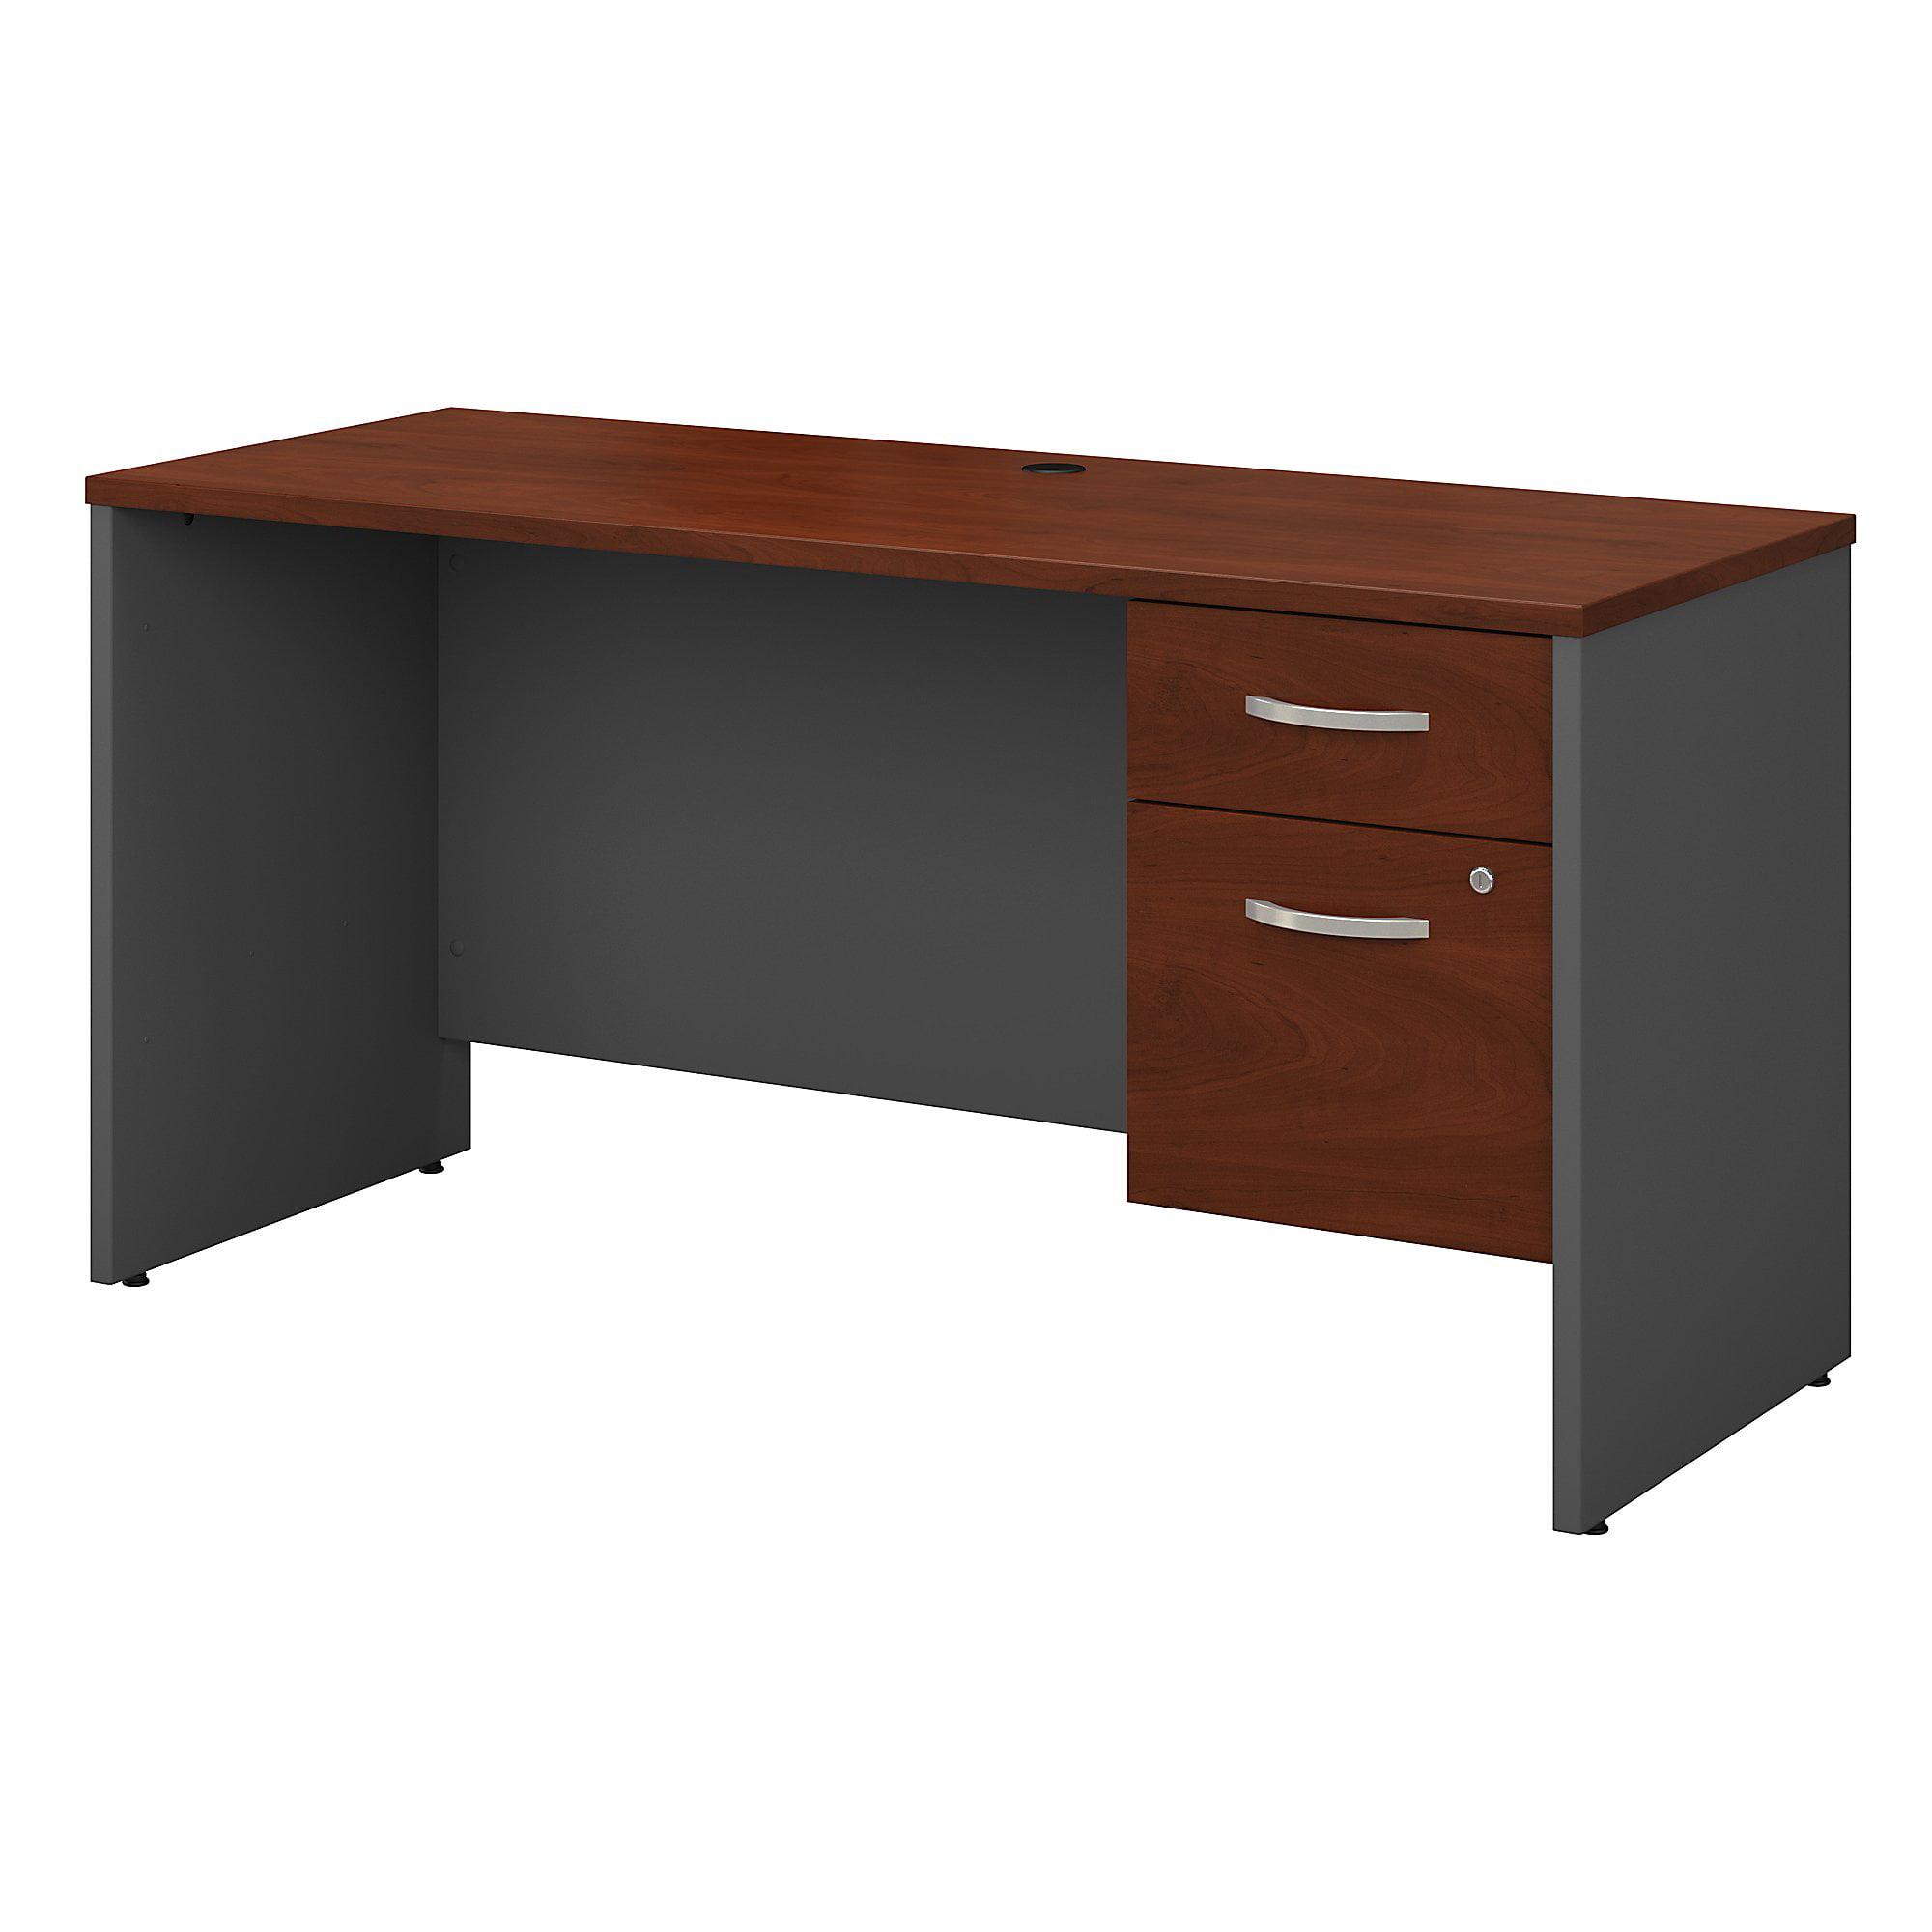 Series c returns bundles 155 lbs weight capacity engineered wood 60 w x 24 d credenza desk shell with 3 4 pedestal walmart com